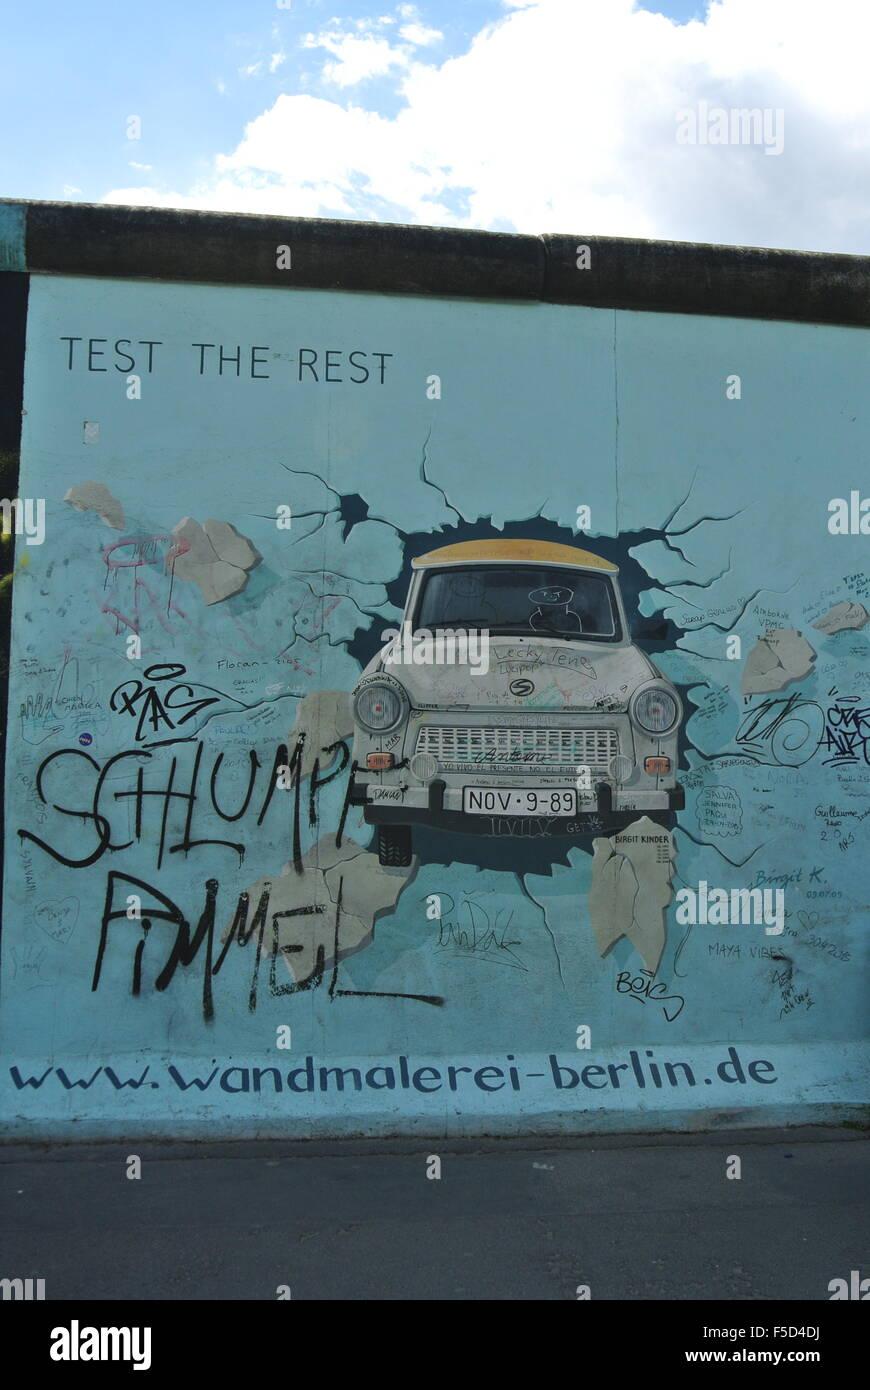 Graffiti, Car smashing through wall, Berlin Wall - Stock Image